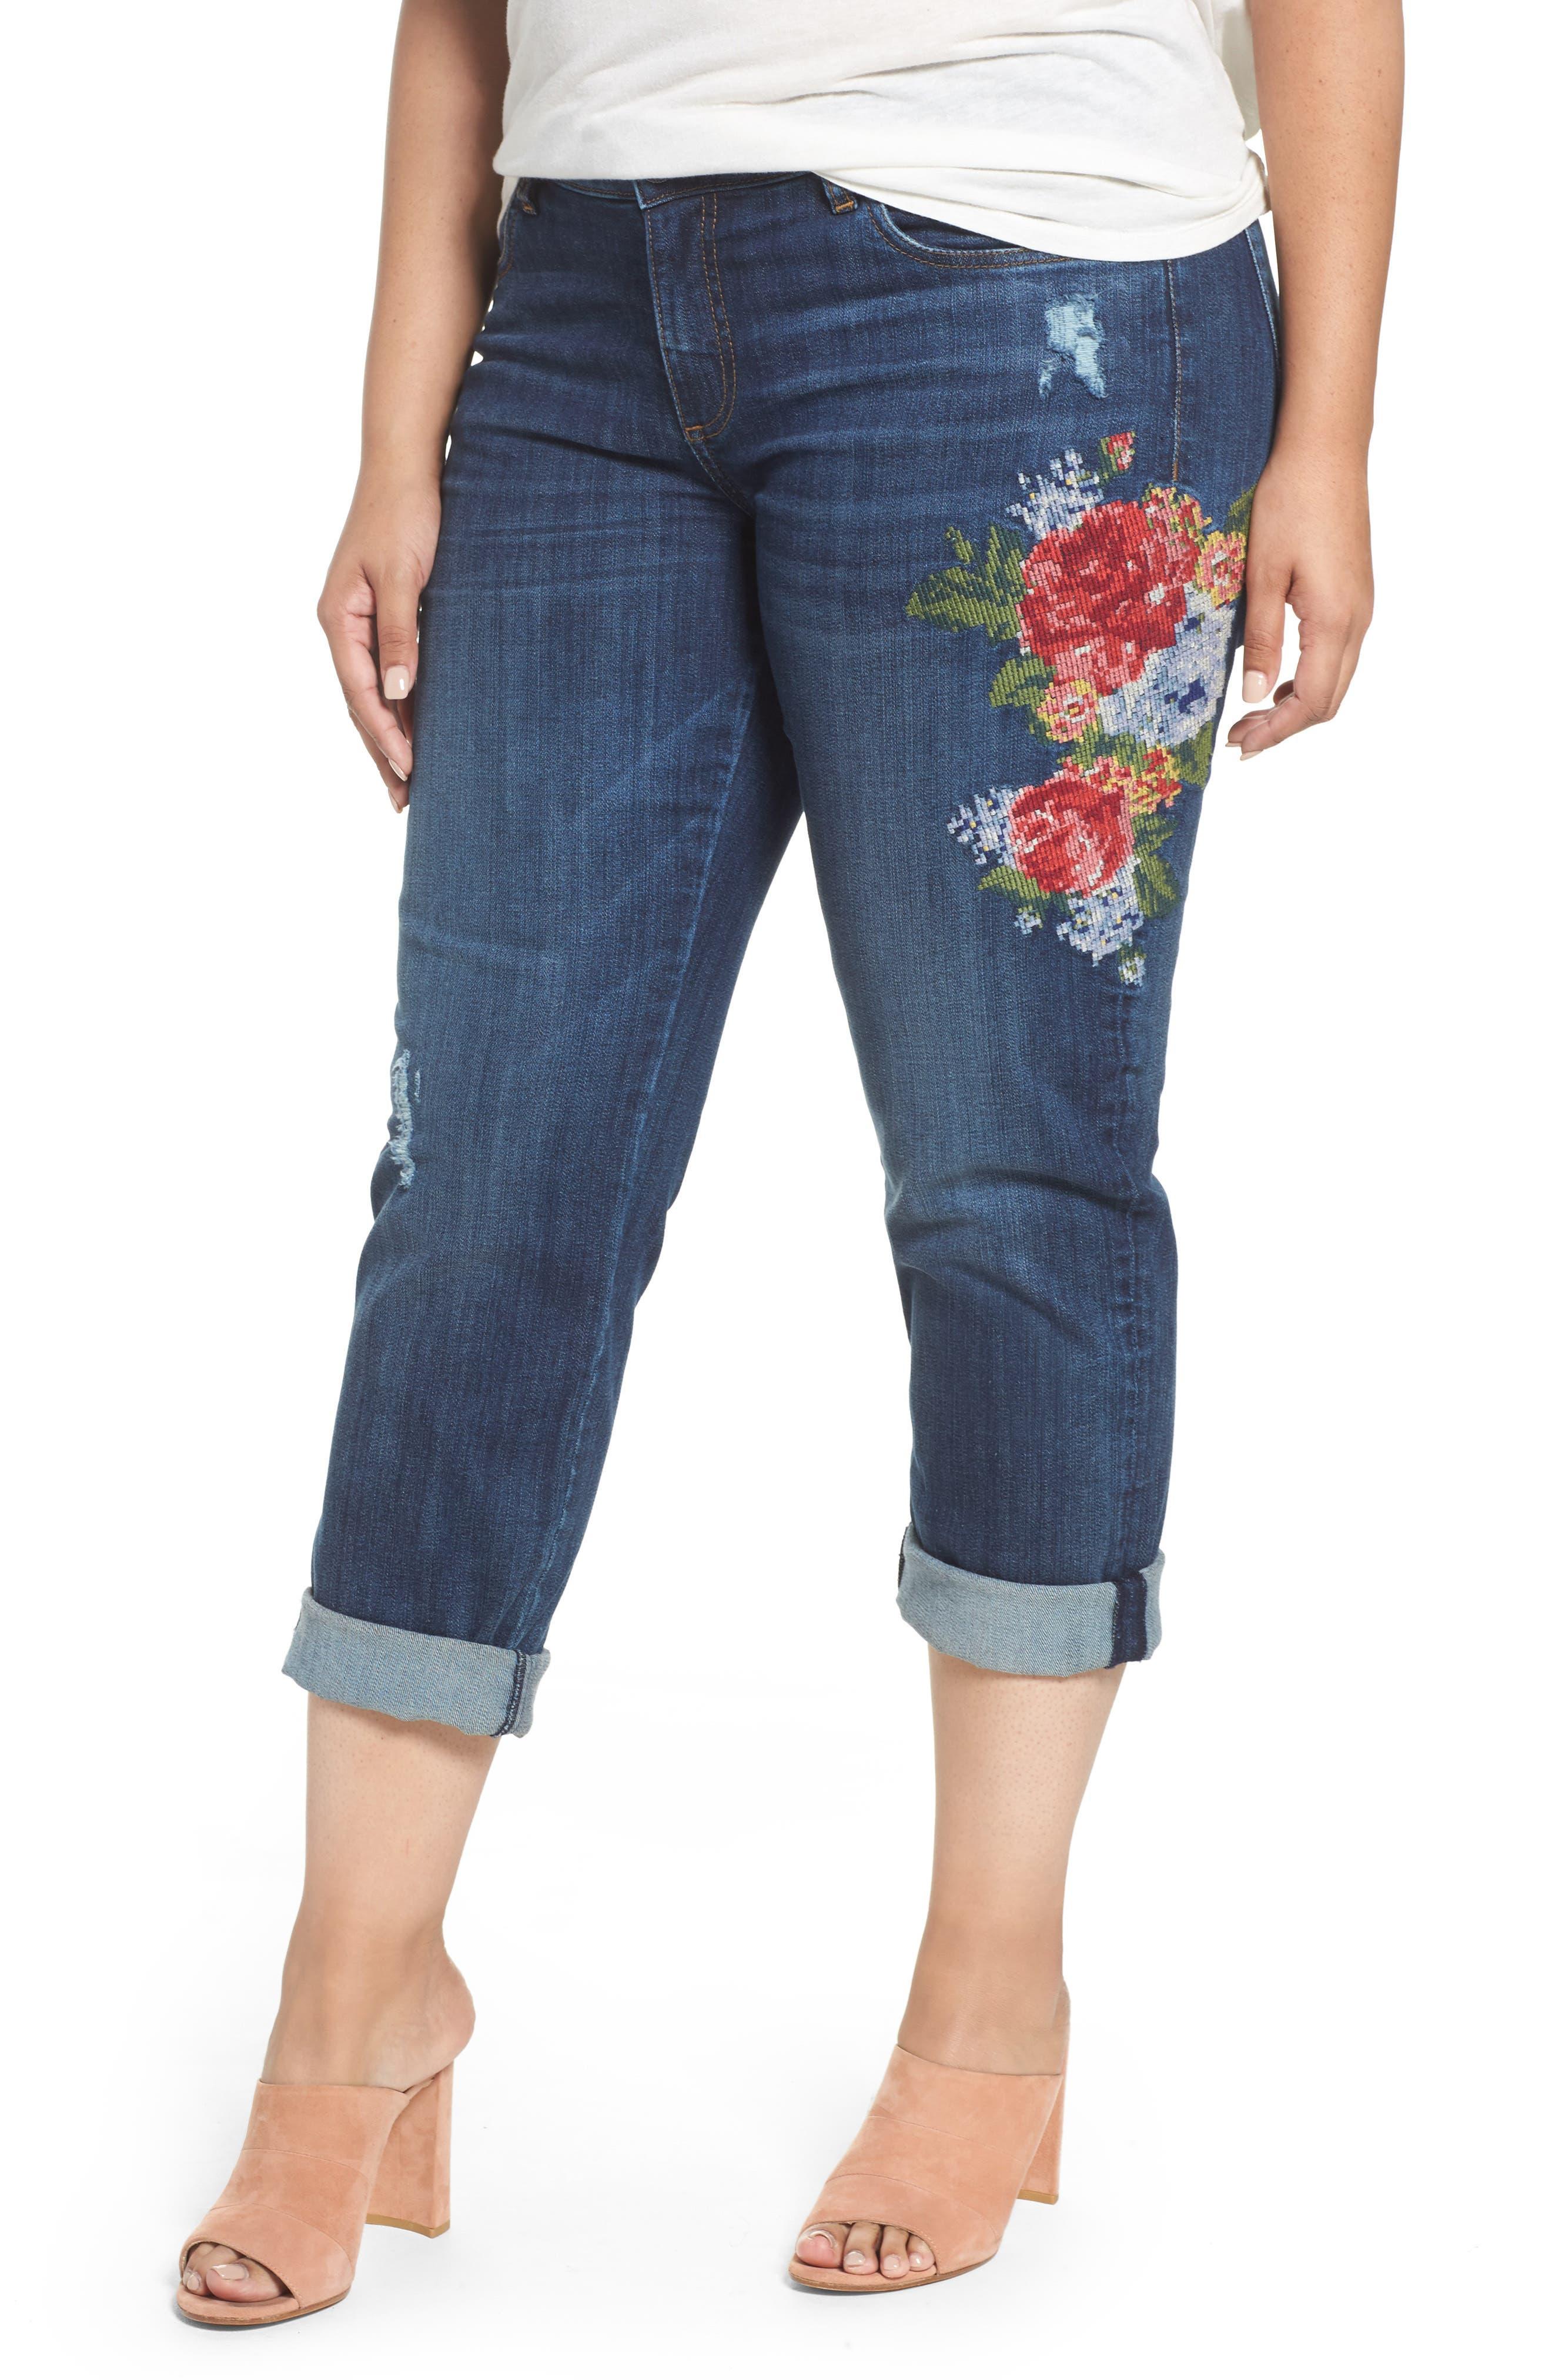 Catherine Embroidered Boyfriend Jeans,                         Main,                         color, Premier Dark Stone Base Wash